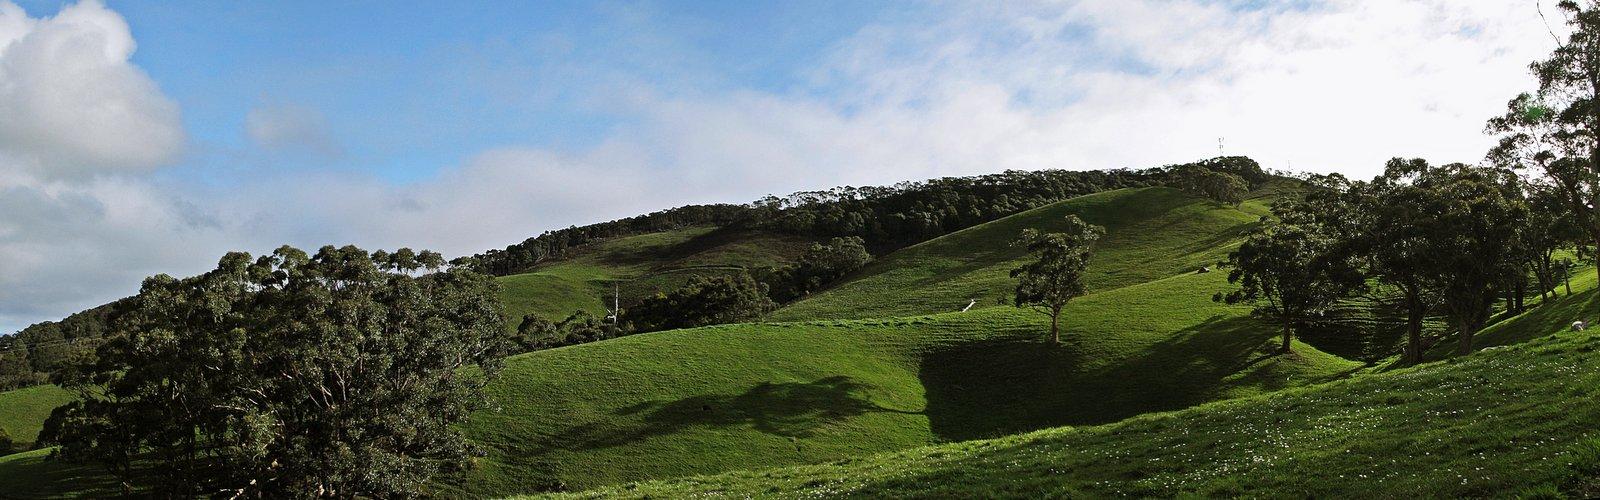 Mount Nicoll